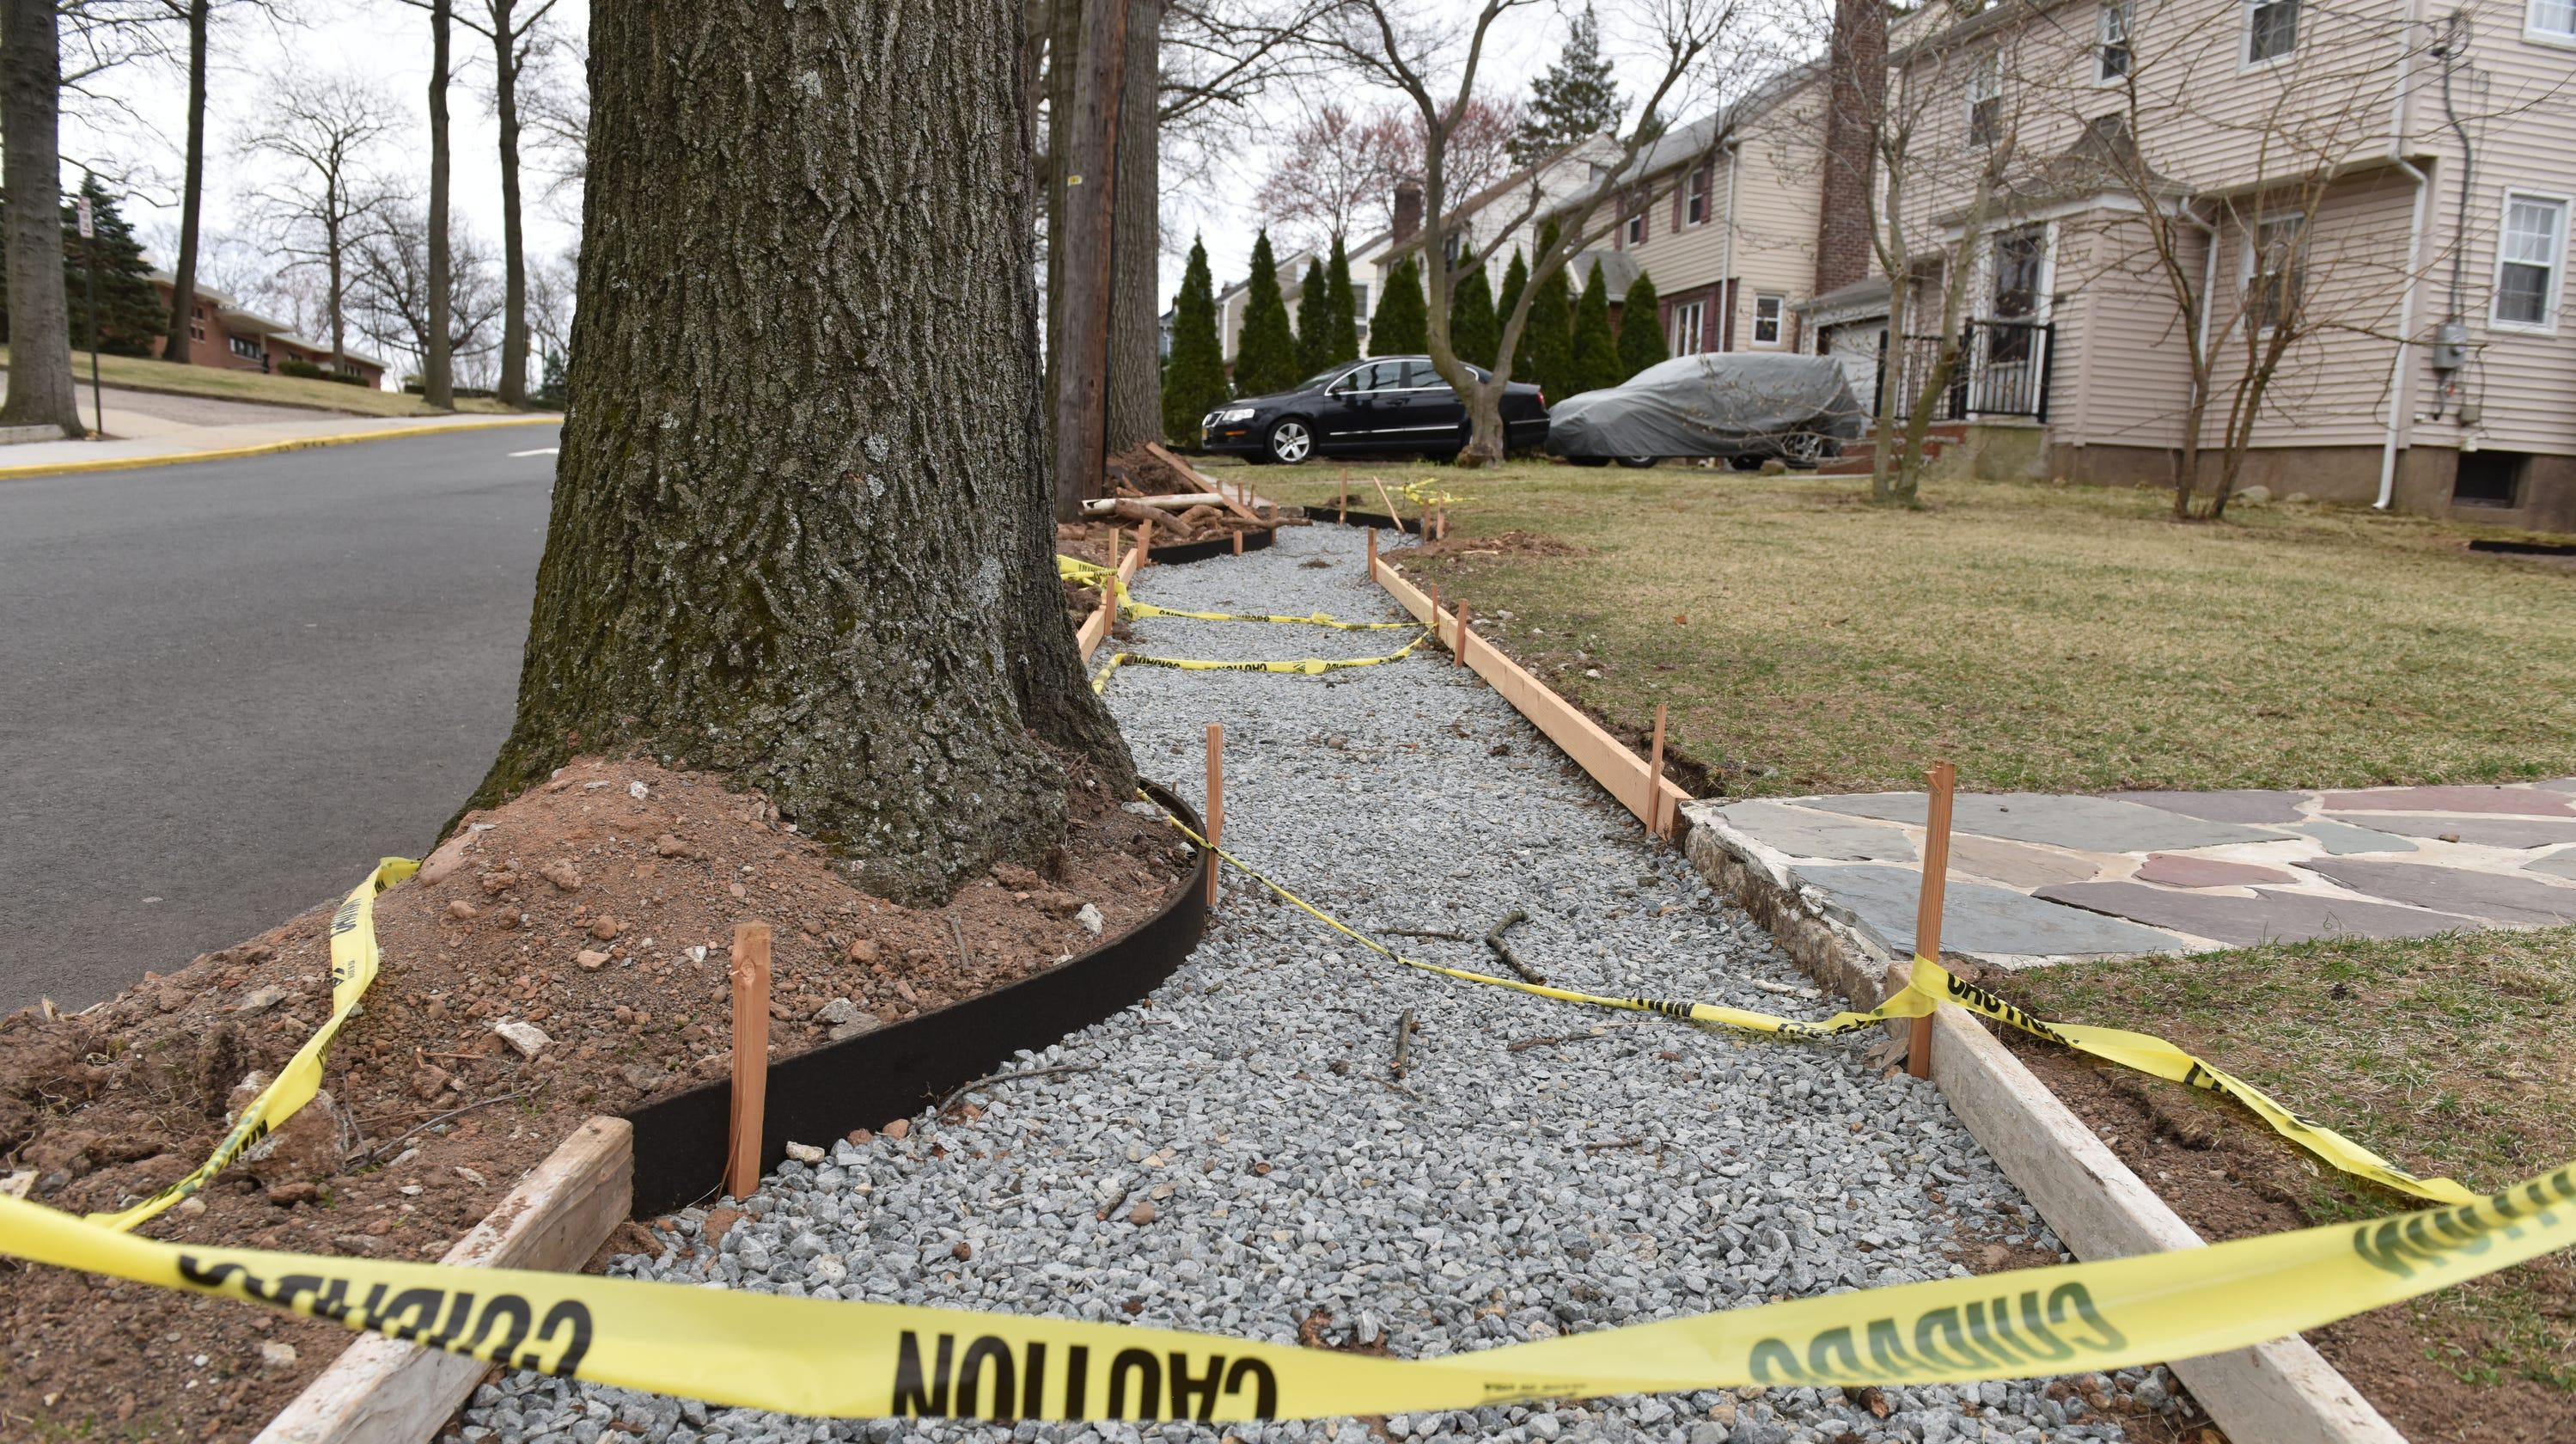 Man's complaints about Teaneck NJ sidewalks cost homeowners